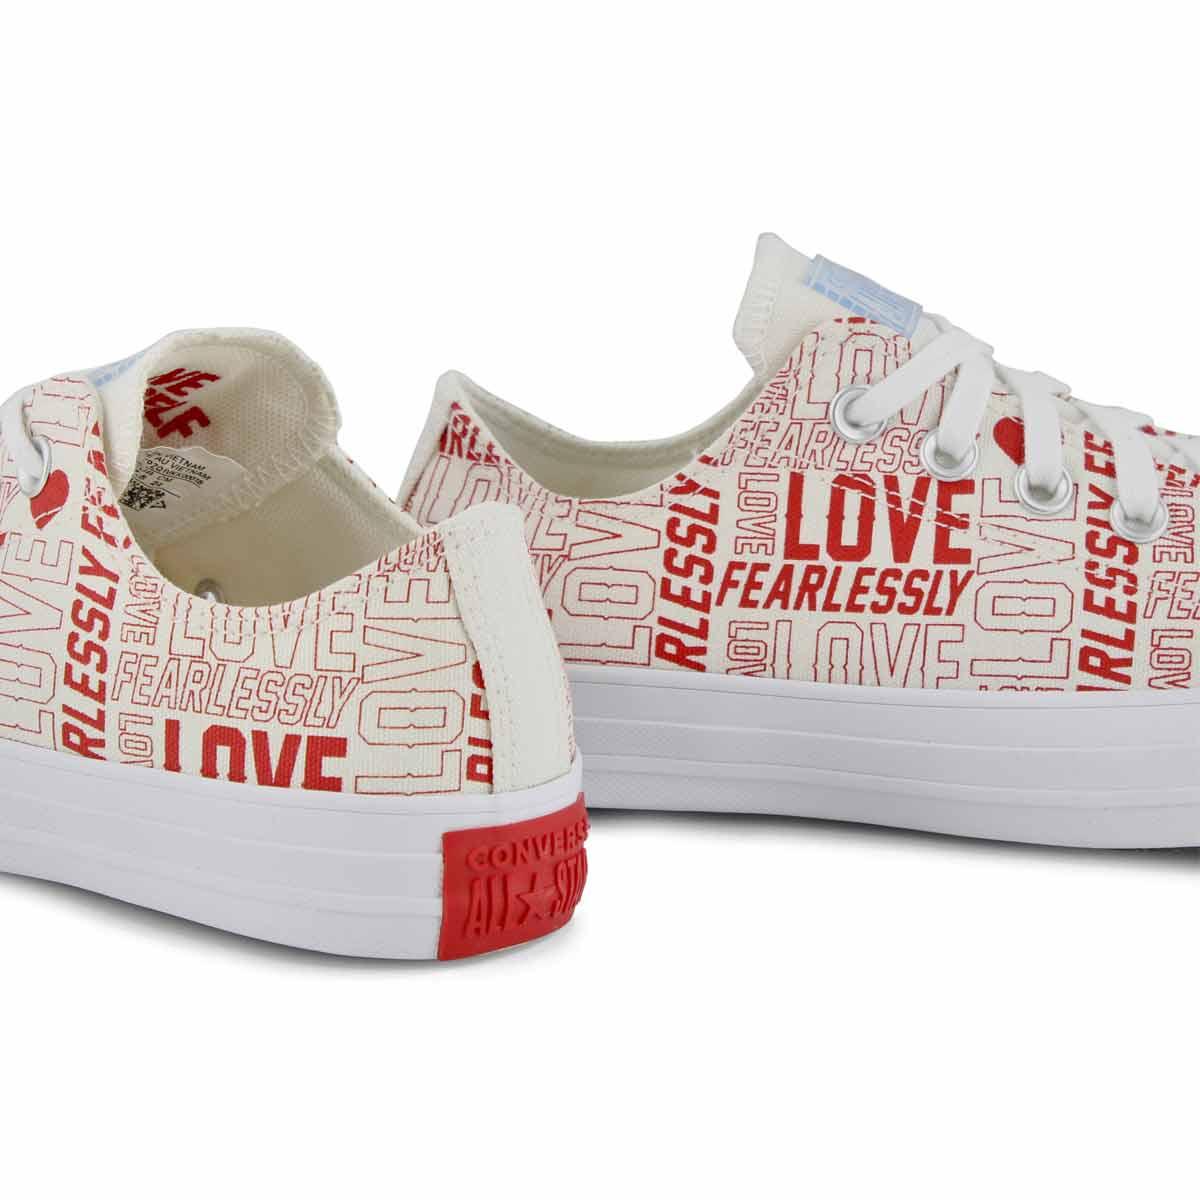 Lds CTAS Love Fearlessly egret/red snkr